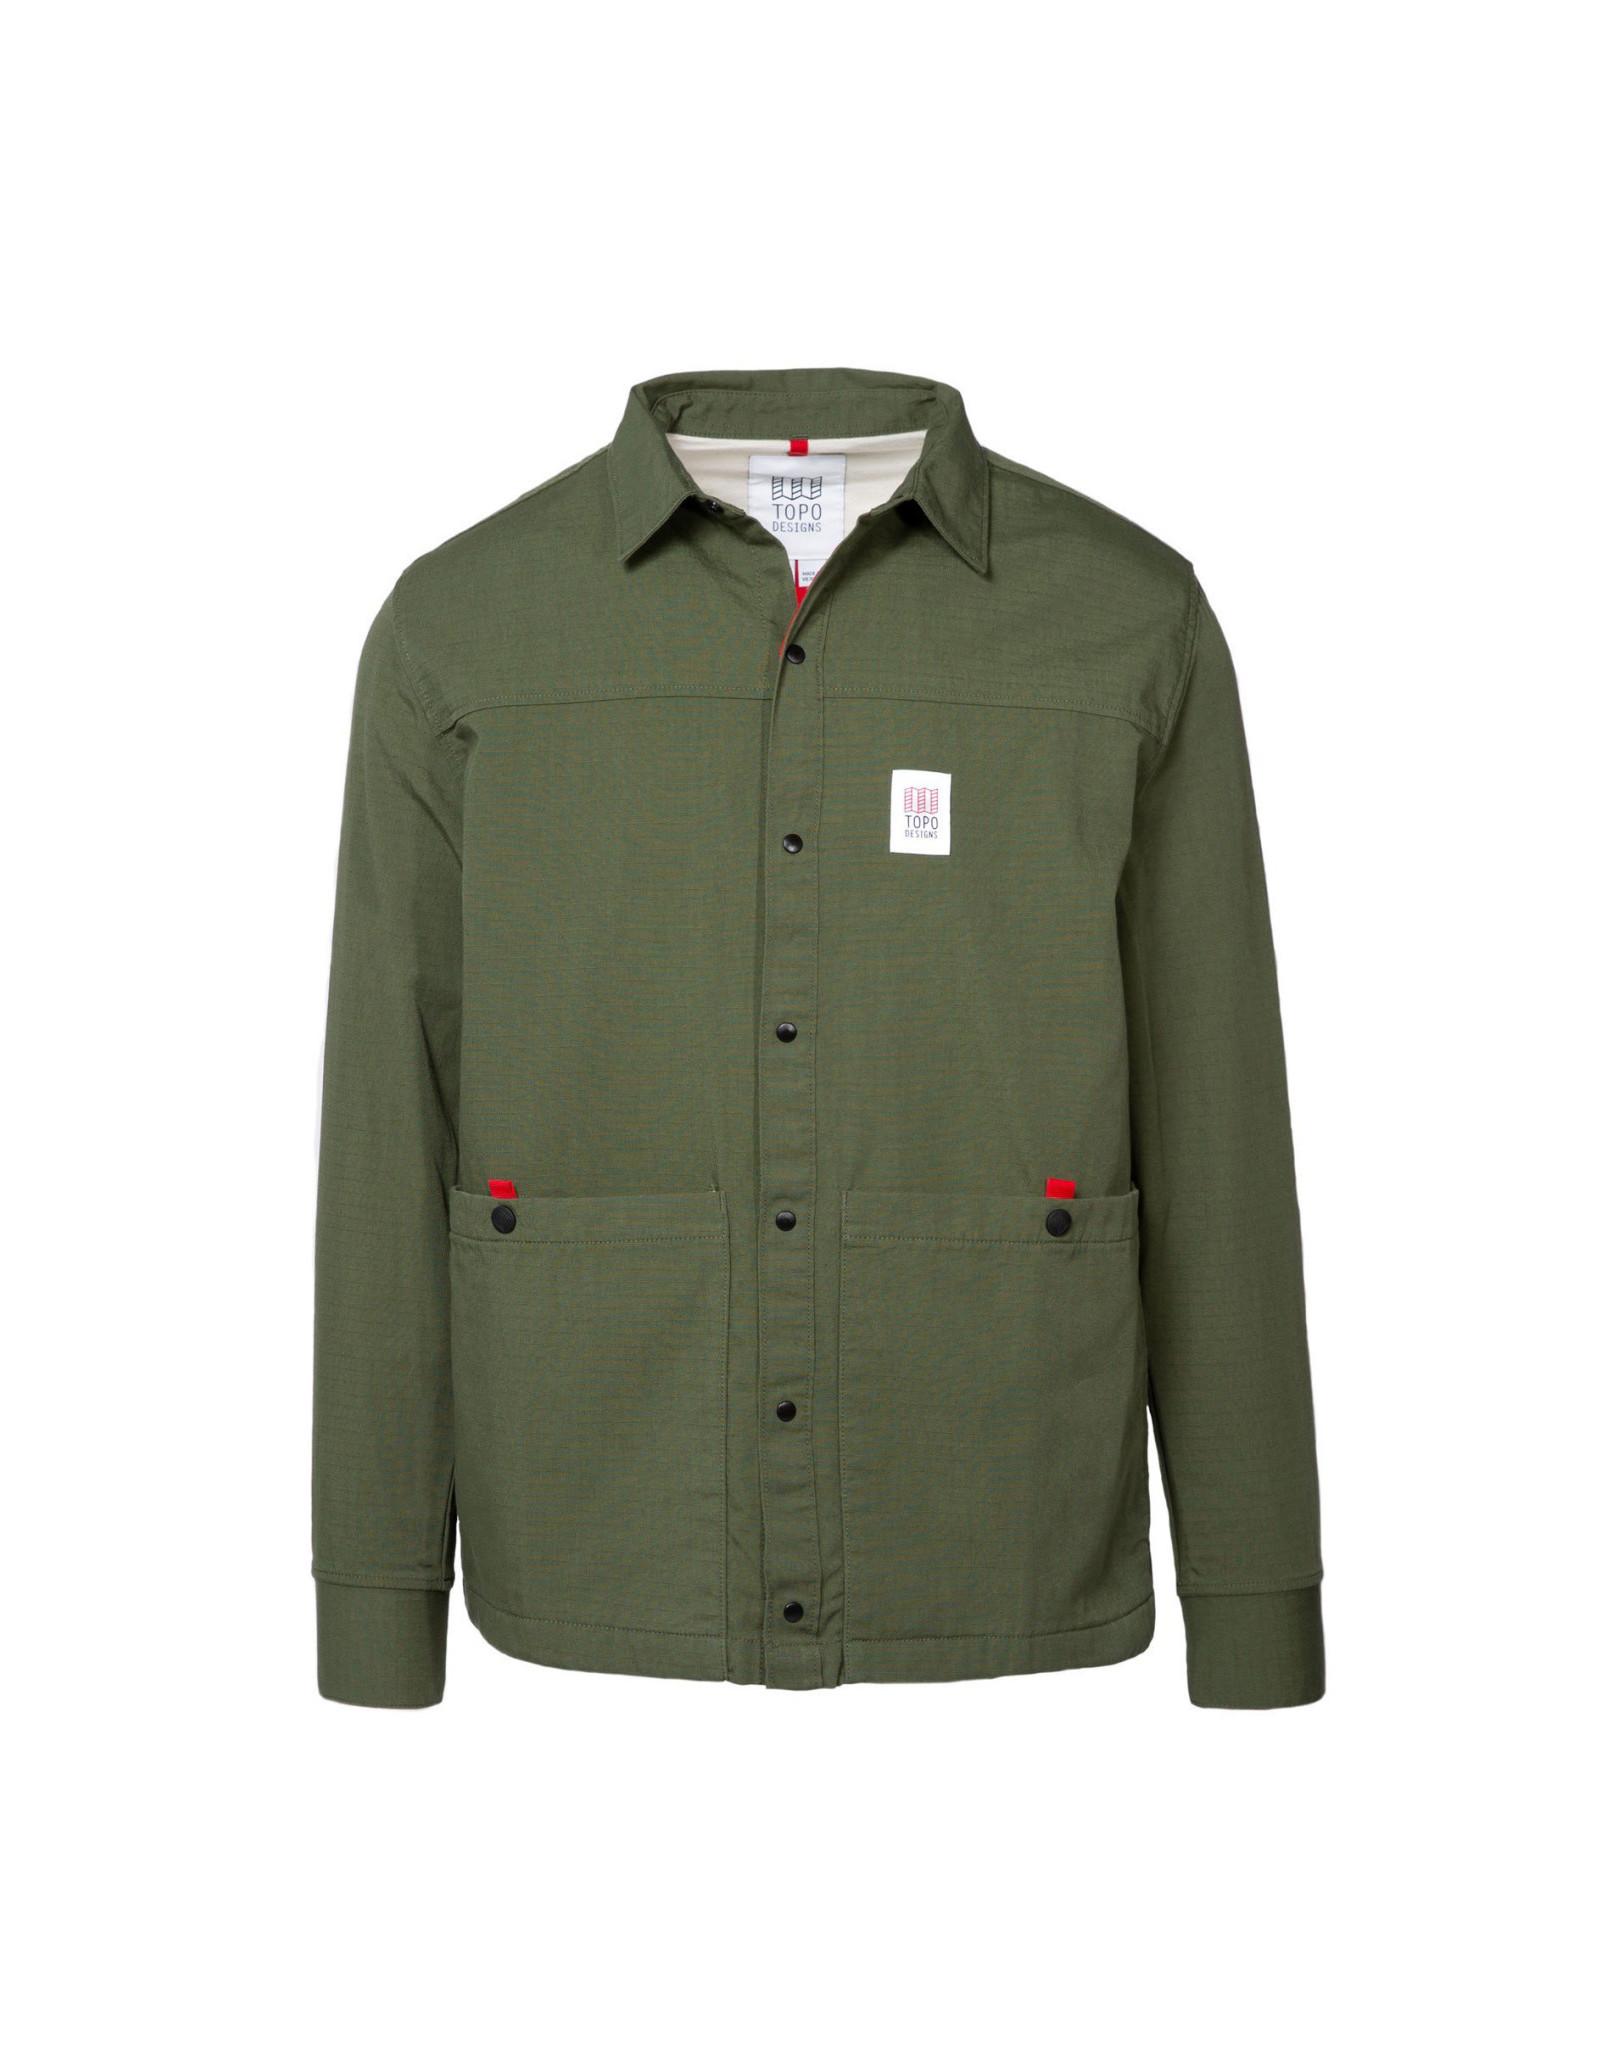 Topo Field Jacket - Olive